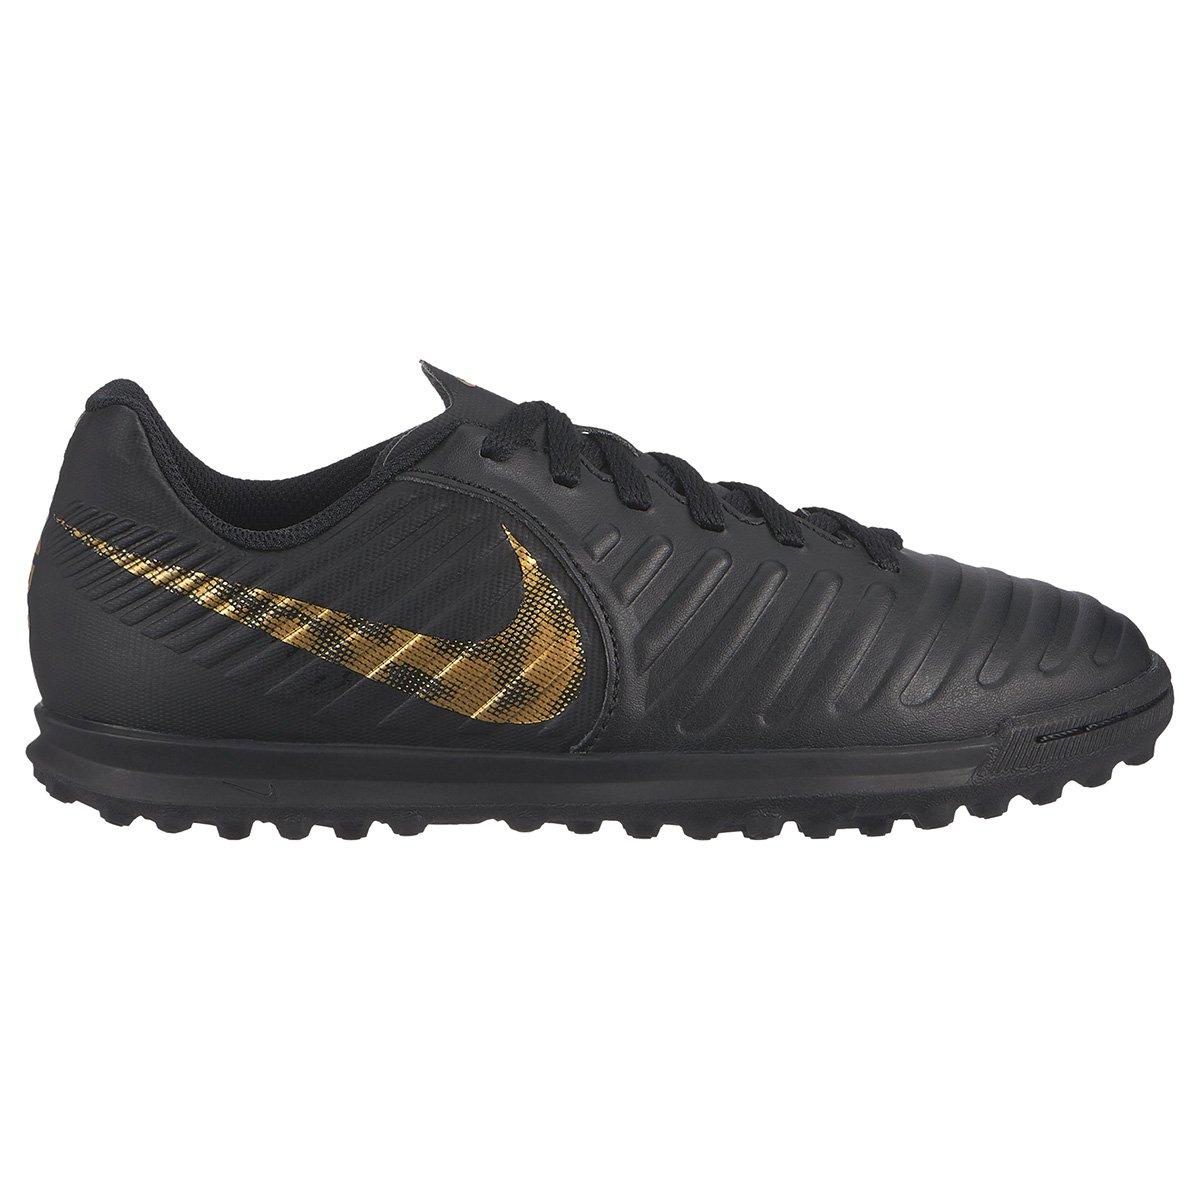 39f3e6ebbc Chuteira Society Infantil Nike Tiempo Legend 7 Club TF - Preto e ...